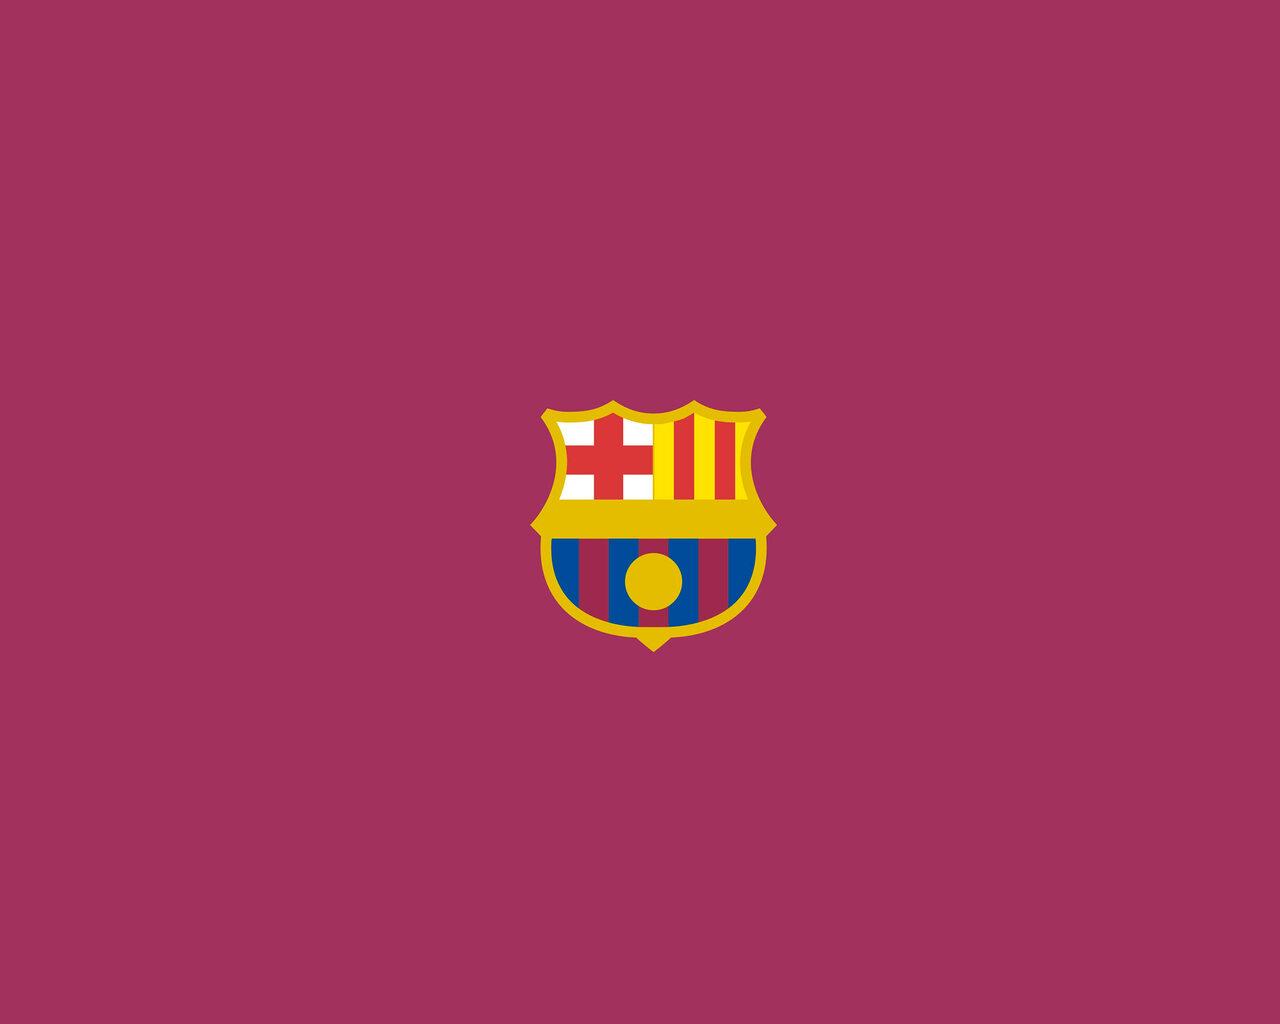 1280x1024 Fc Barcelona Logo Minimalism 1280x1024 Resolution Hd 4k